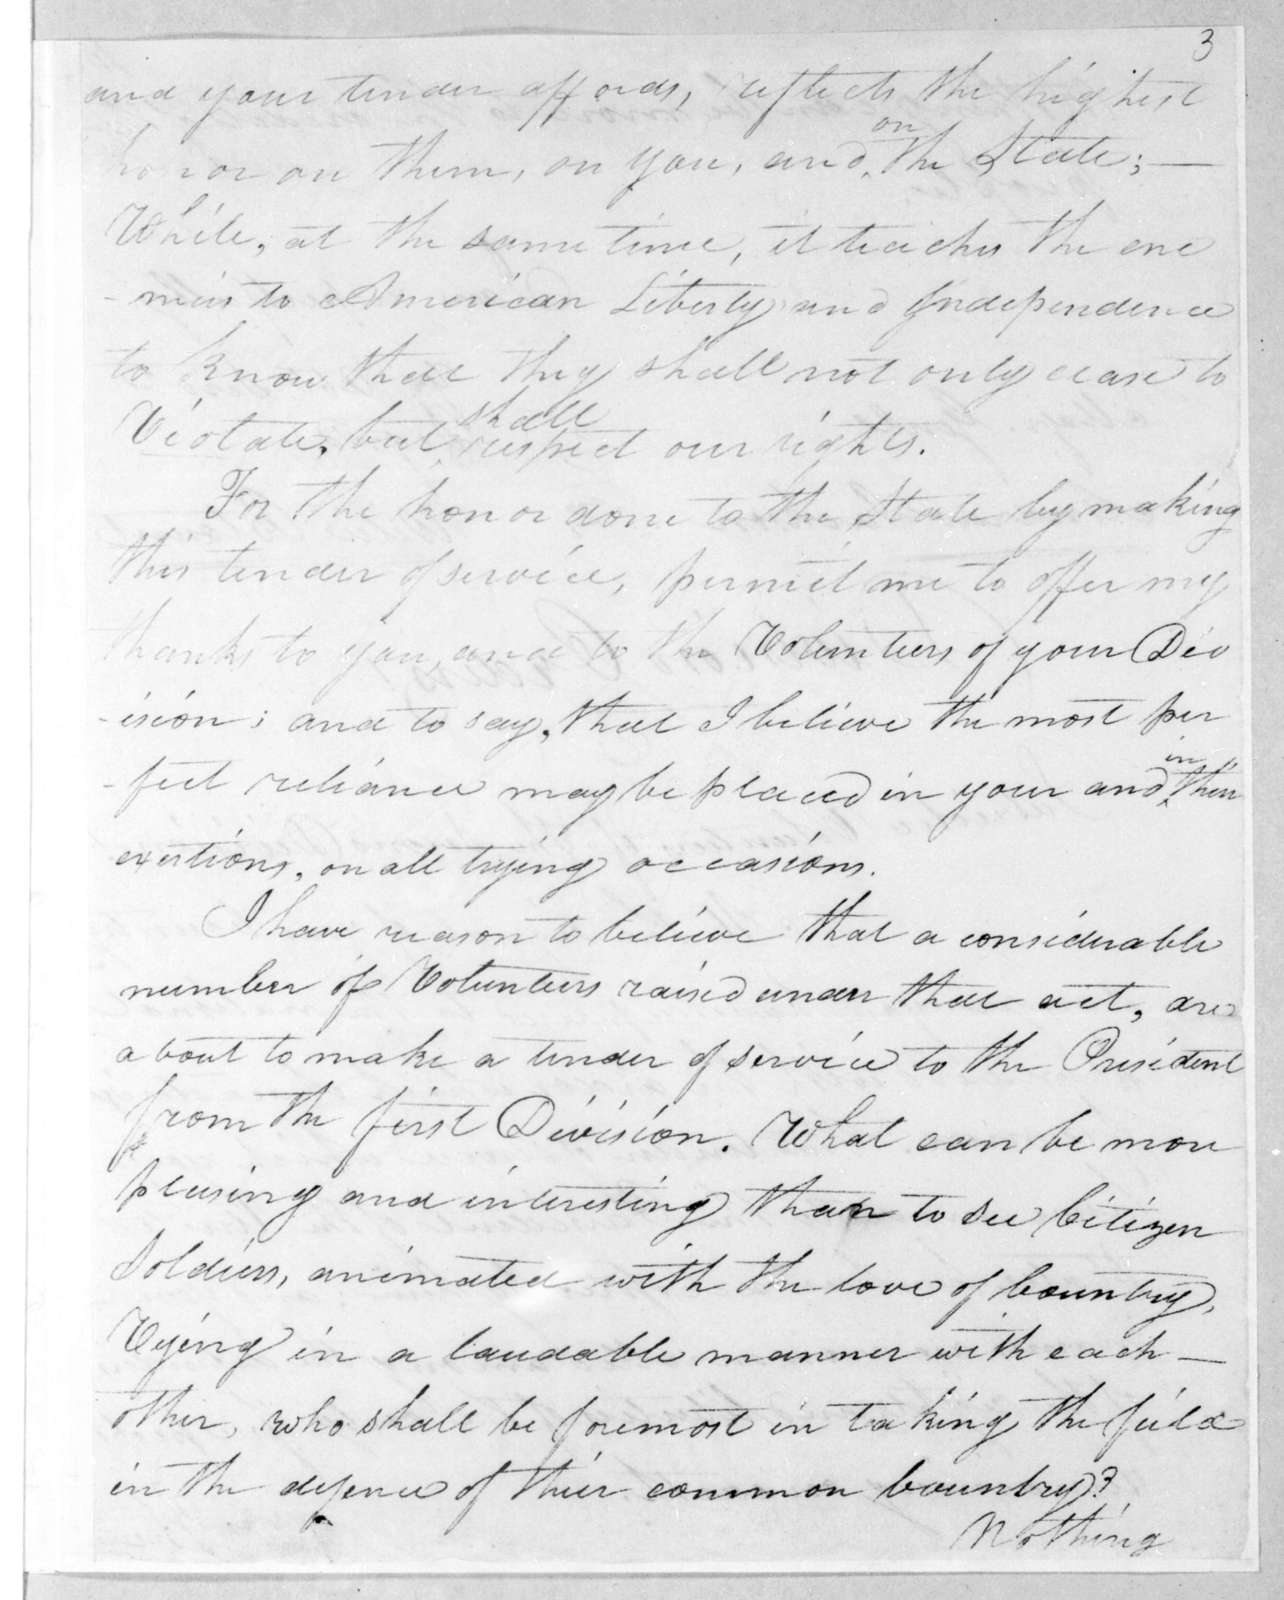 William Eustis to Willie Blount, July 11, 1812